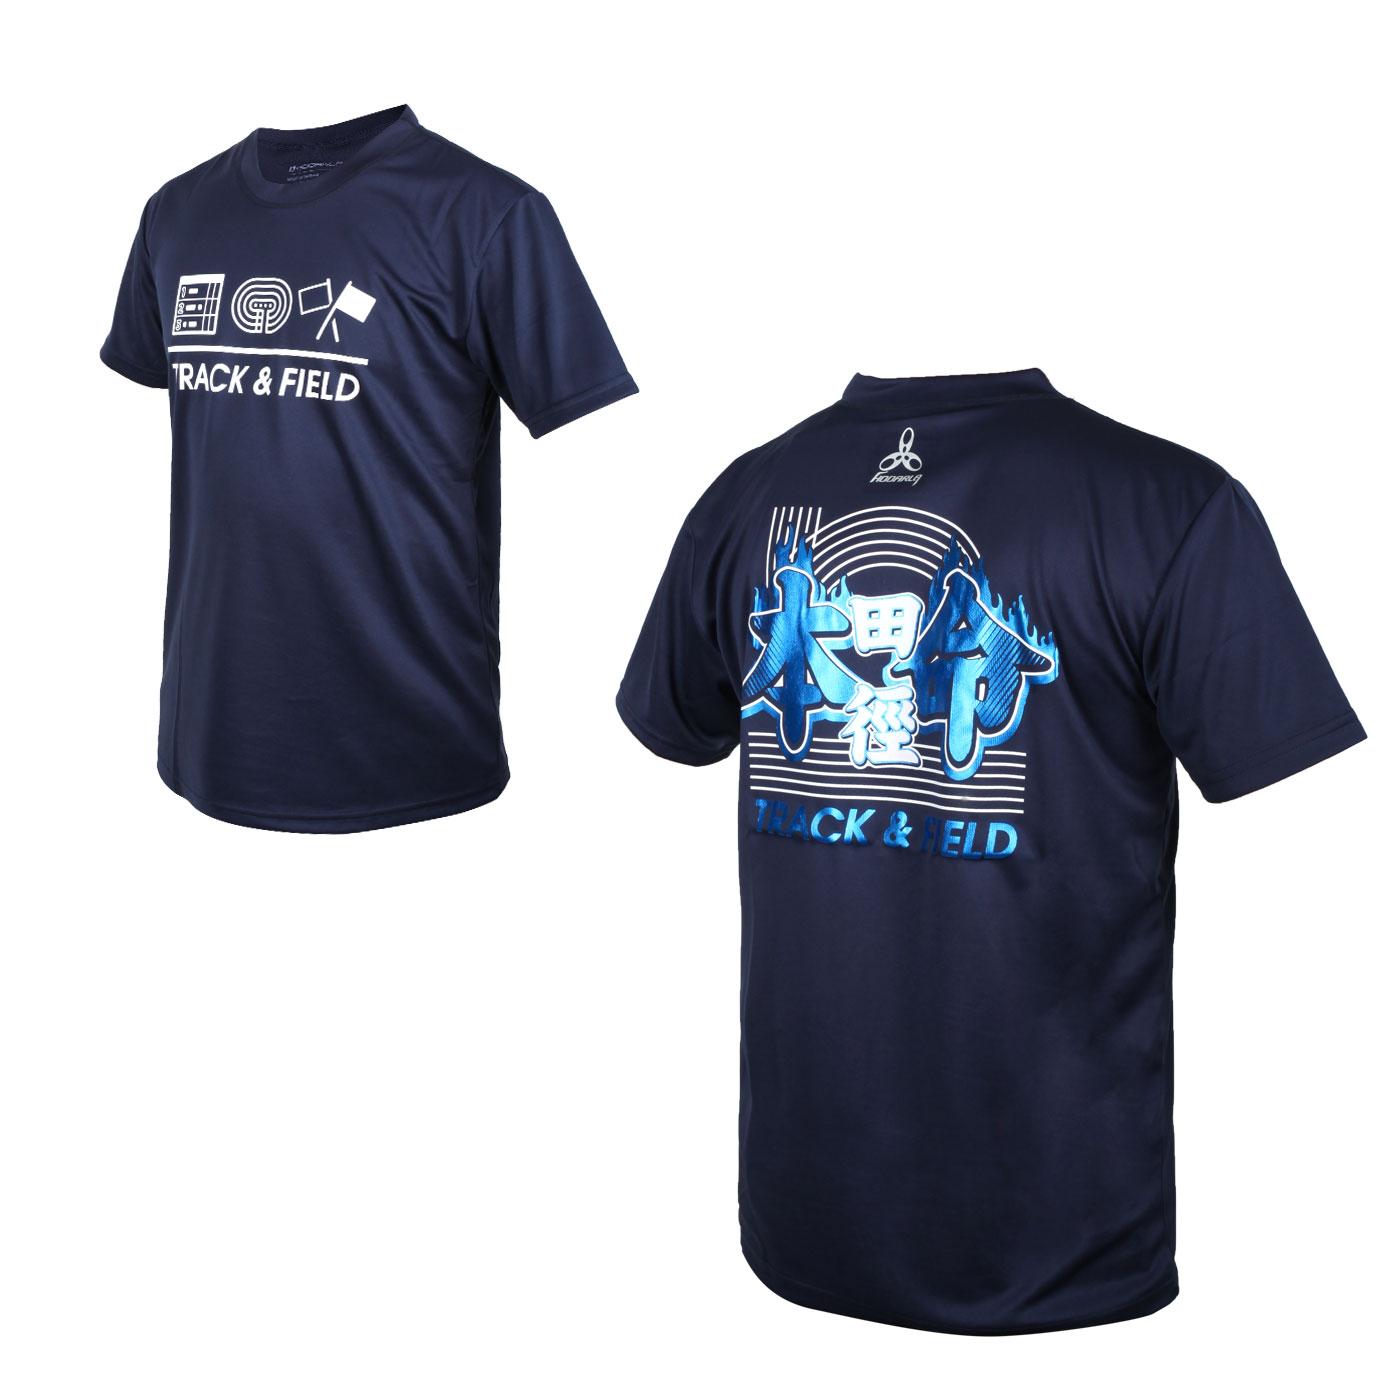 HODARLA 2021青年盃漢字T-田徑本命 3159902 - 丈青藍白